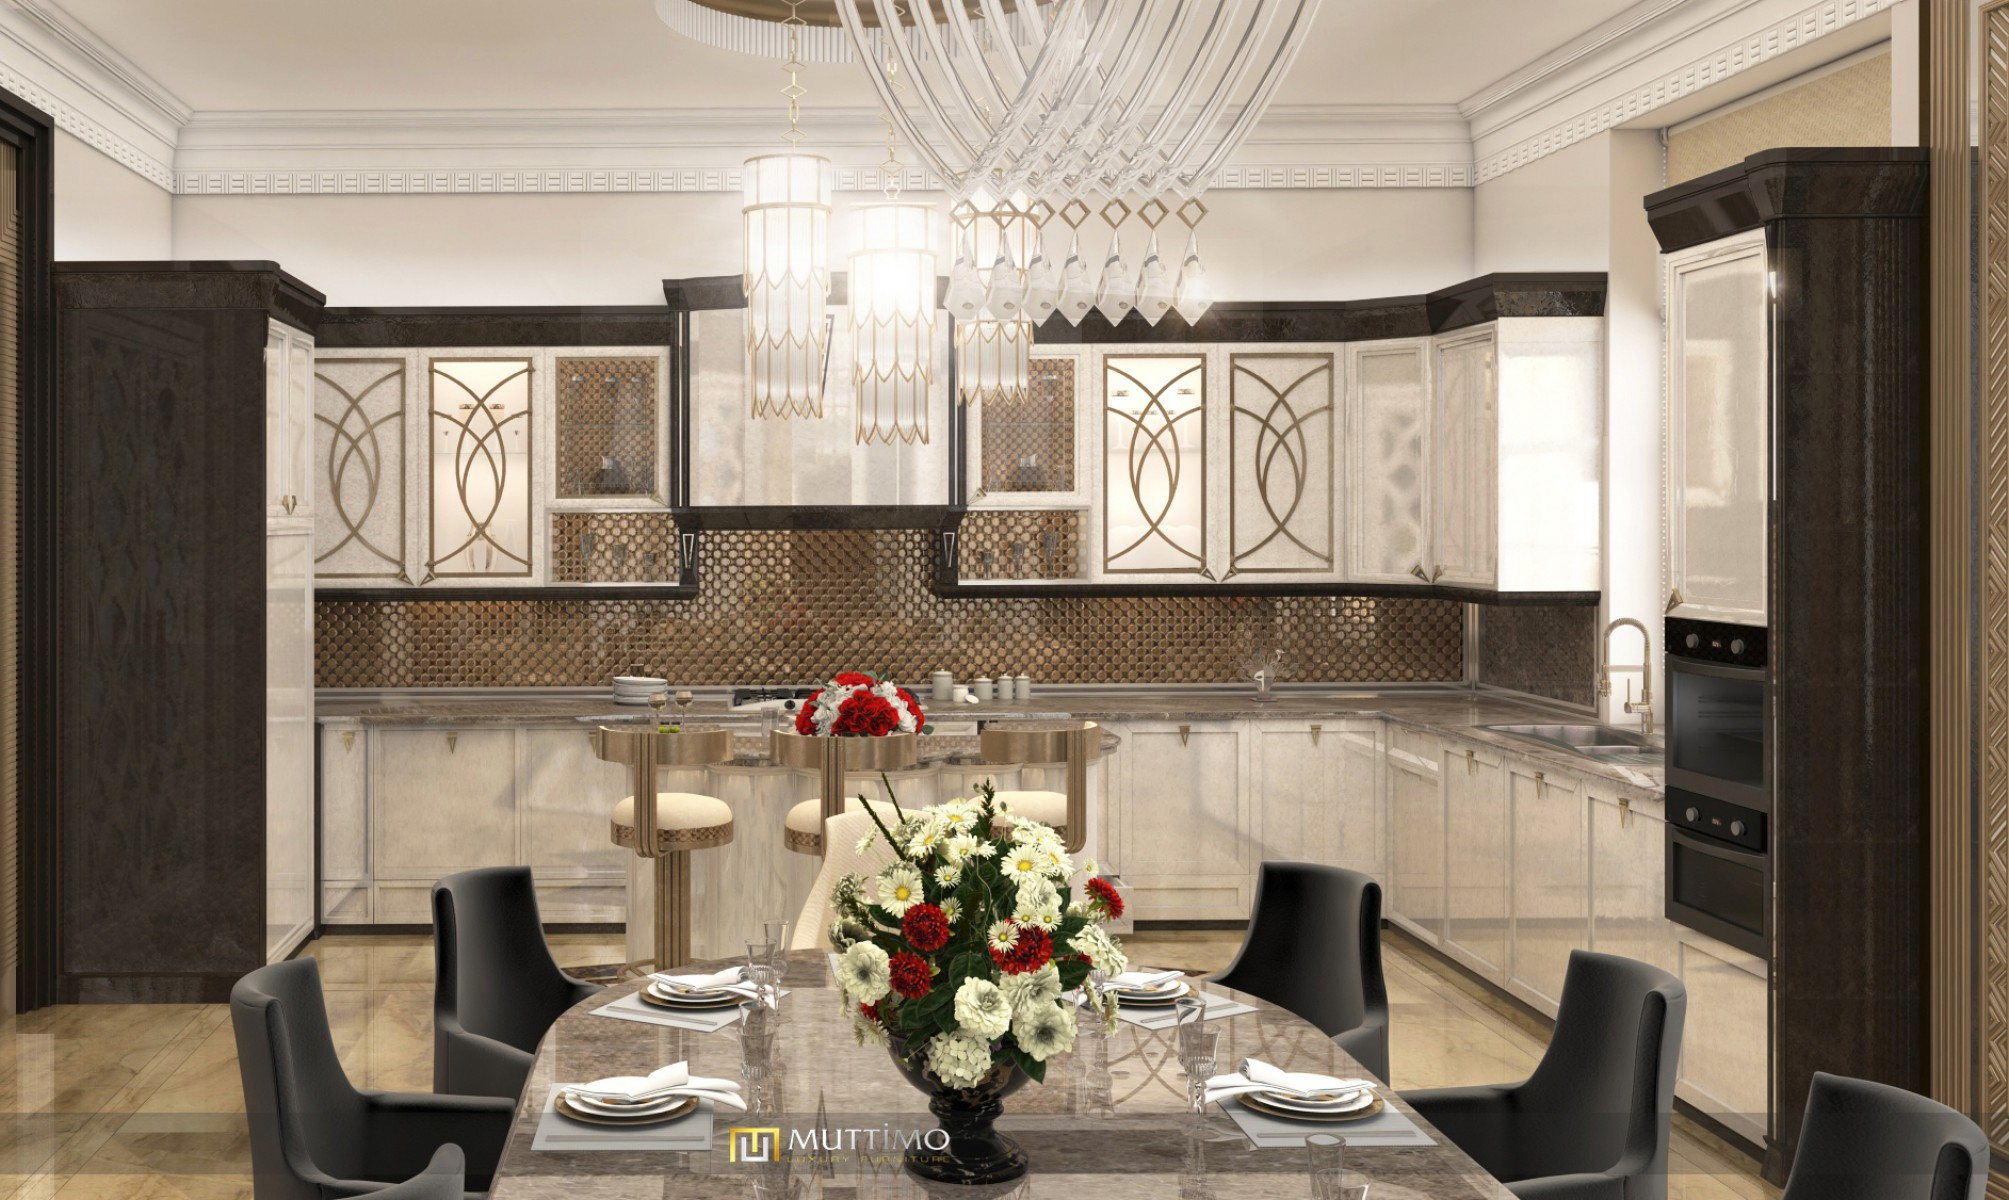 Brıga Towers Elçin Bey Mutfak Rusya